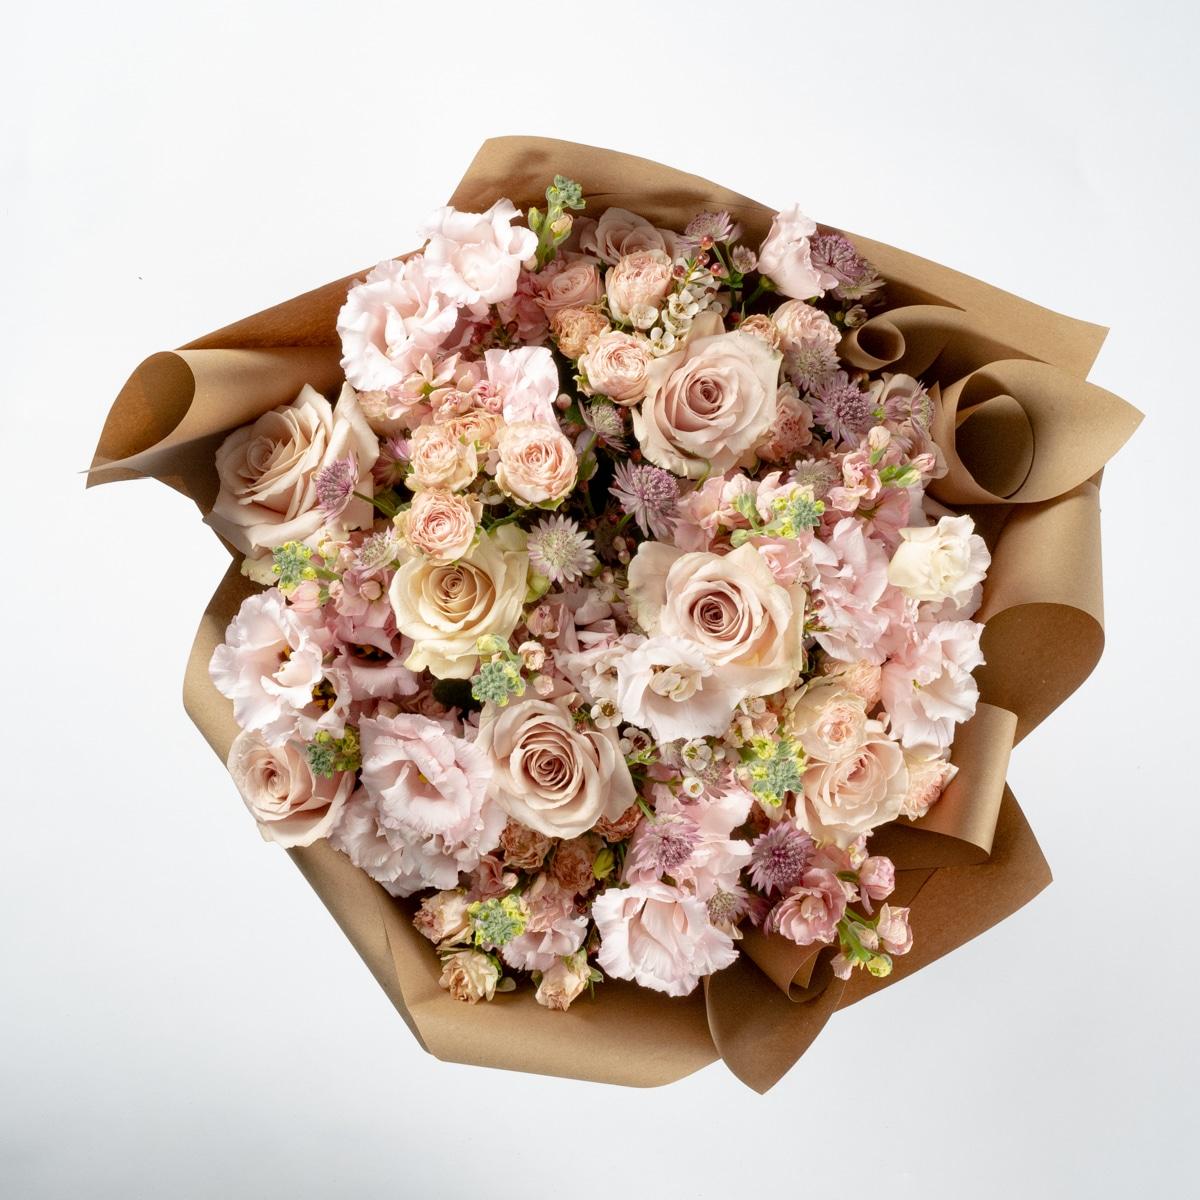 Bloom Flower Delivery | Pemberley Bouquet